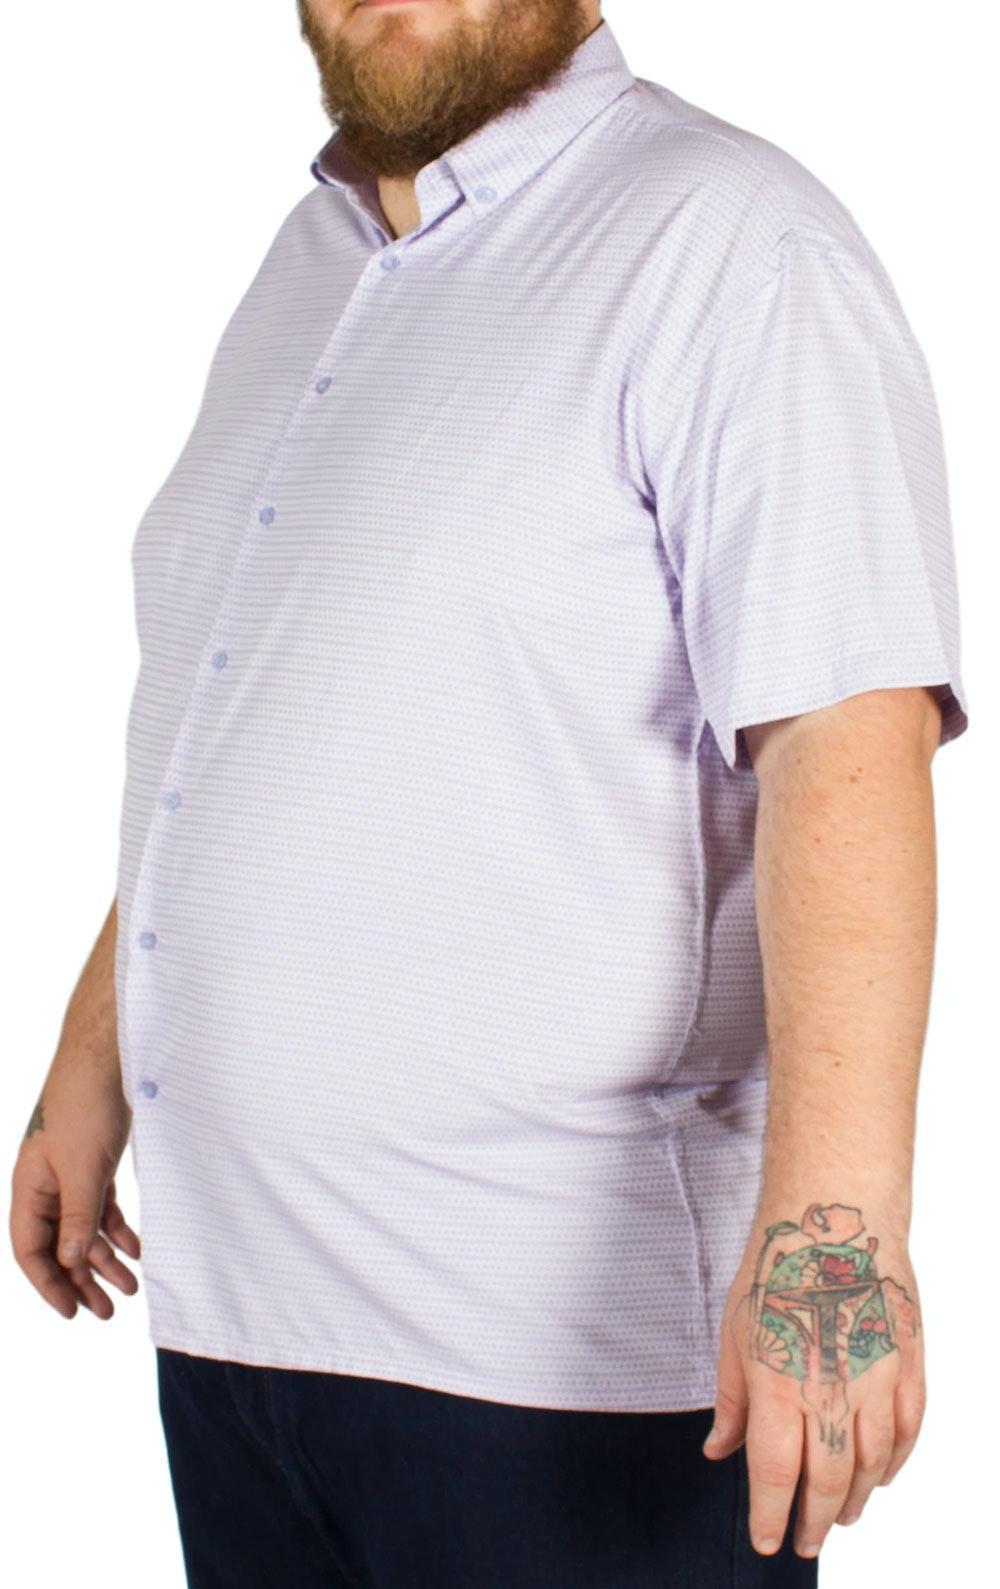 Fitzgerald Amos Heart and Diamond Print Shirt Purple